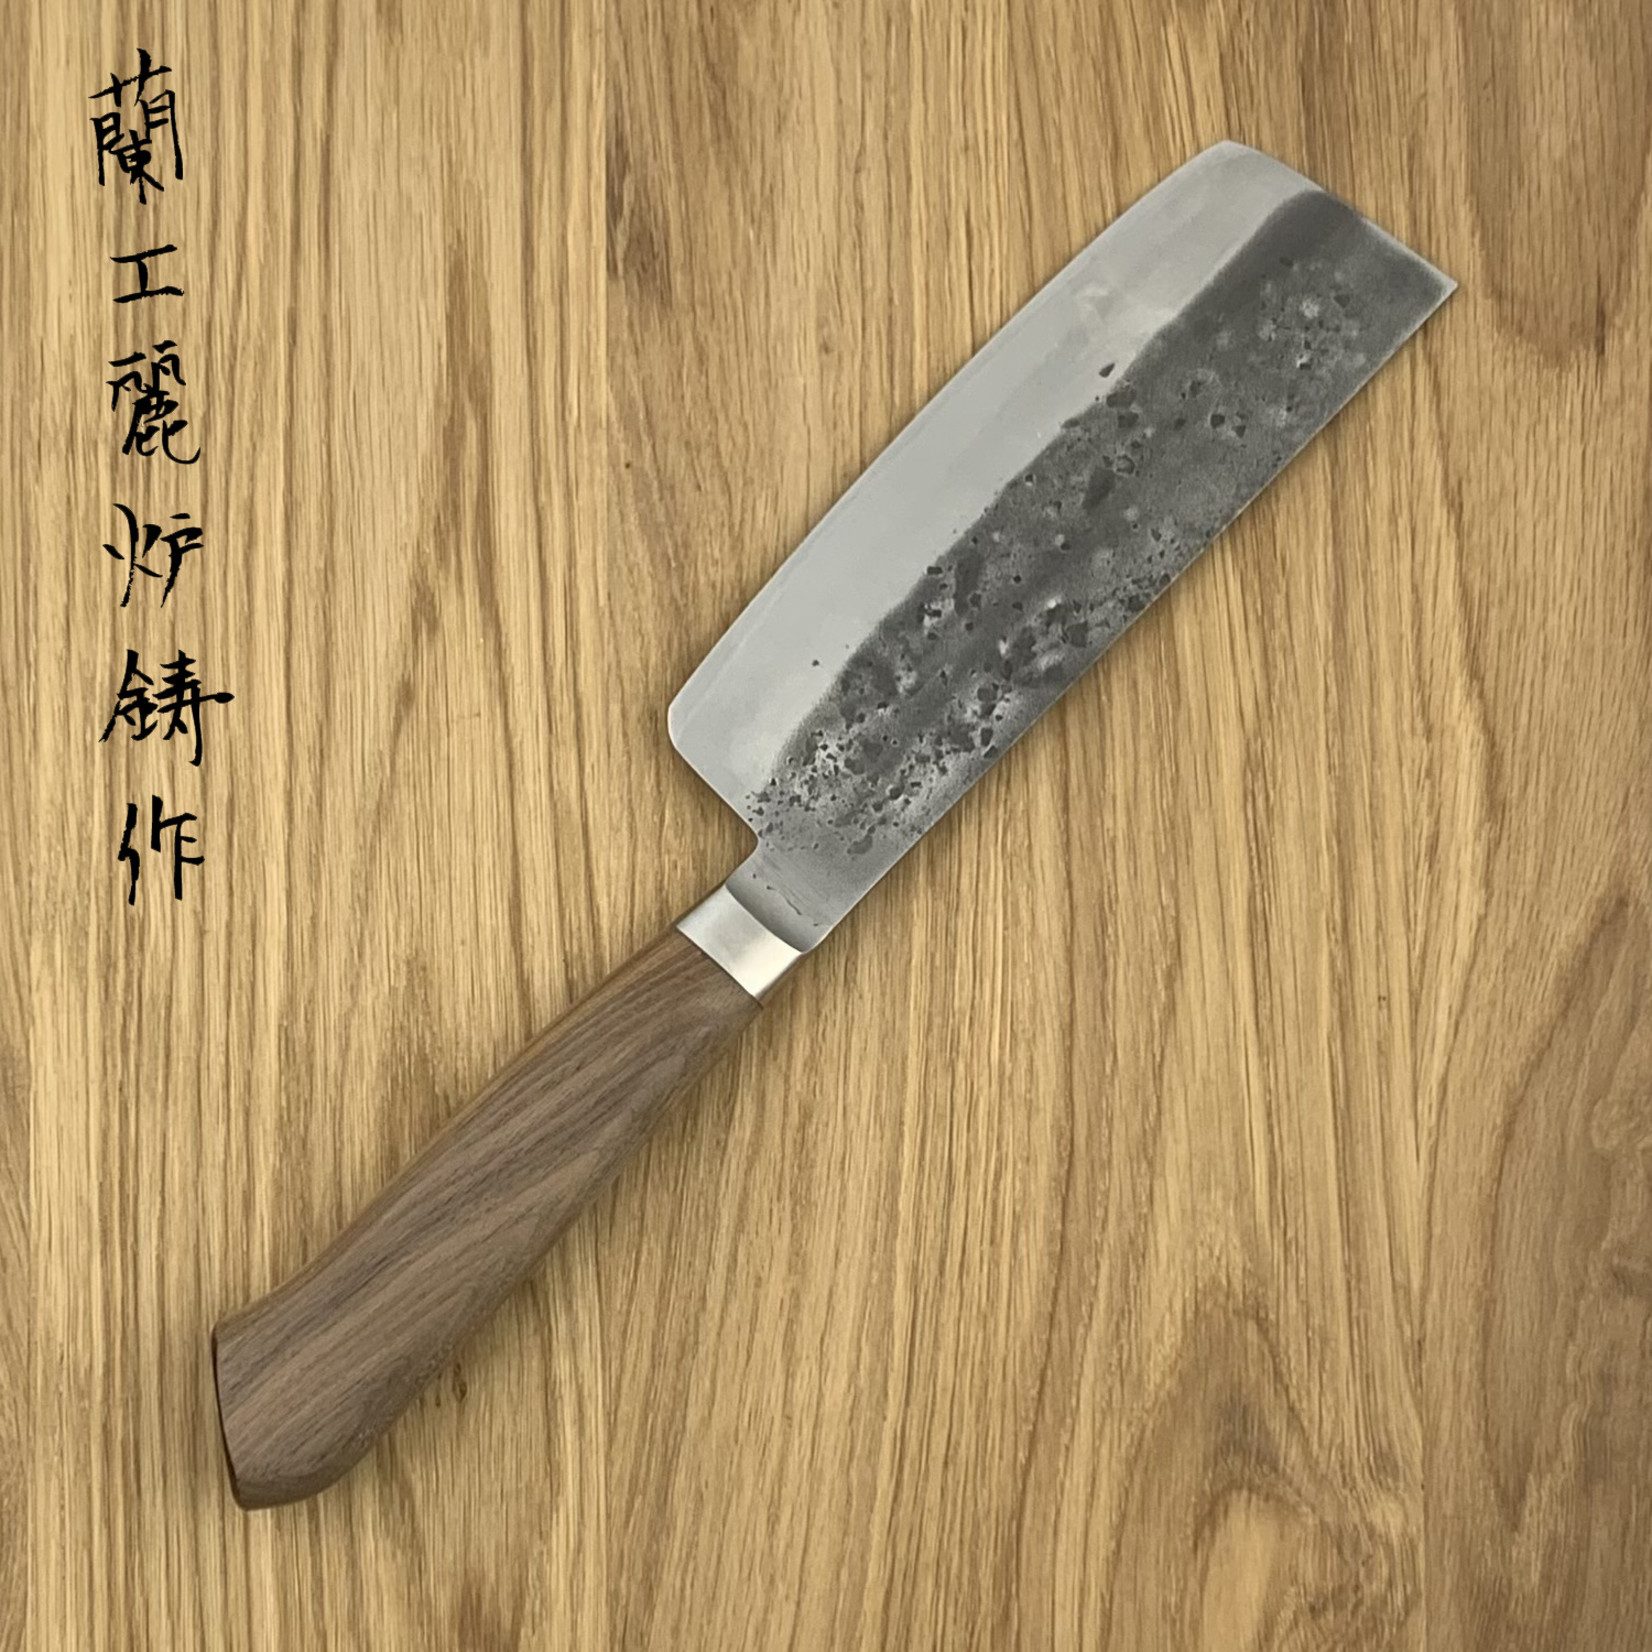 TADAFUSA Nakiri 150mm Aogami #2 Walnut handle TFNA150NW